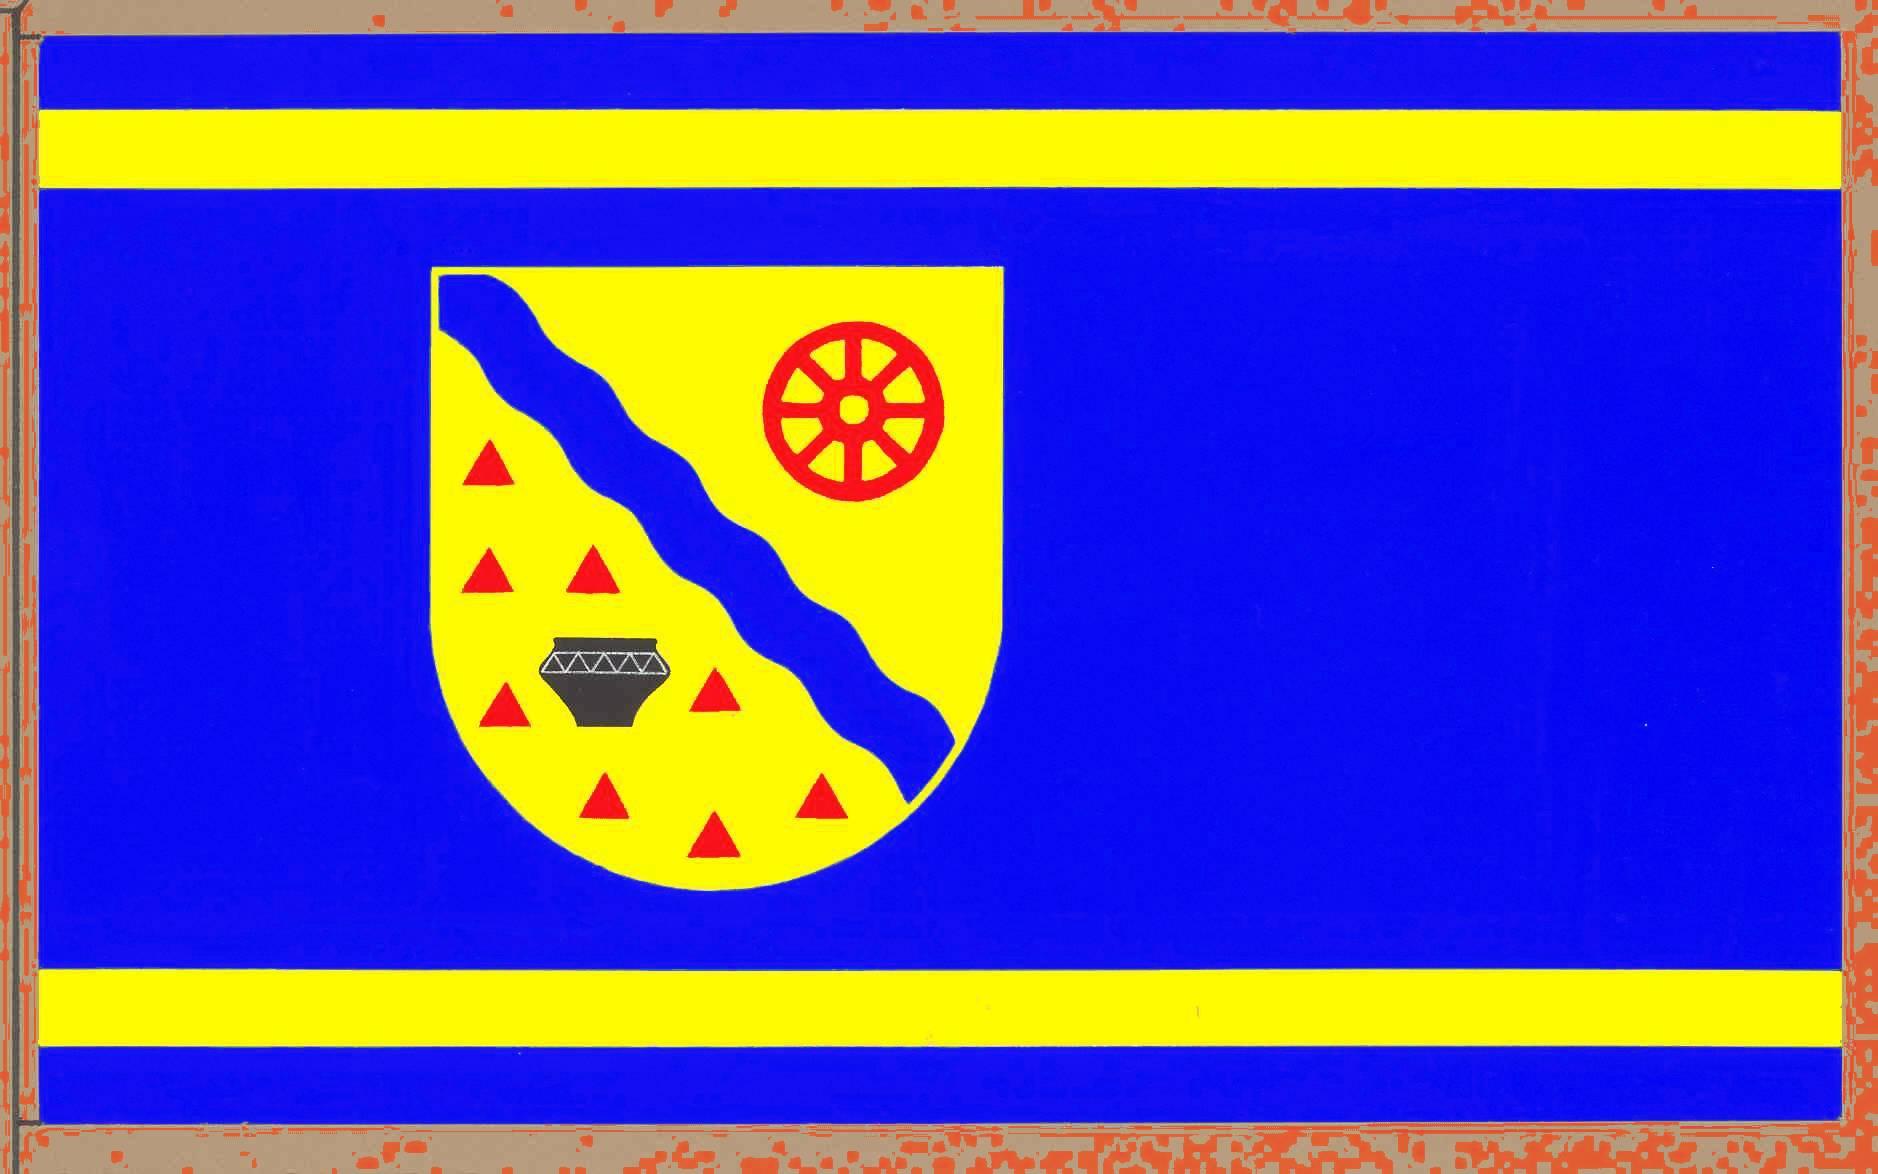 Flagge GemeindeOsterrönfeld, Kreis Rendsburg-Eckernförde